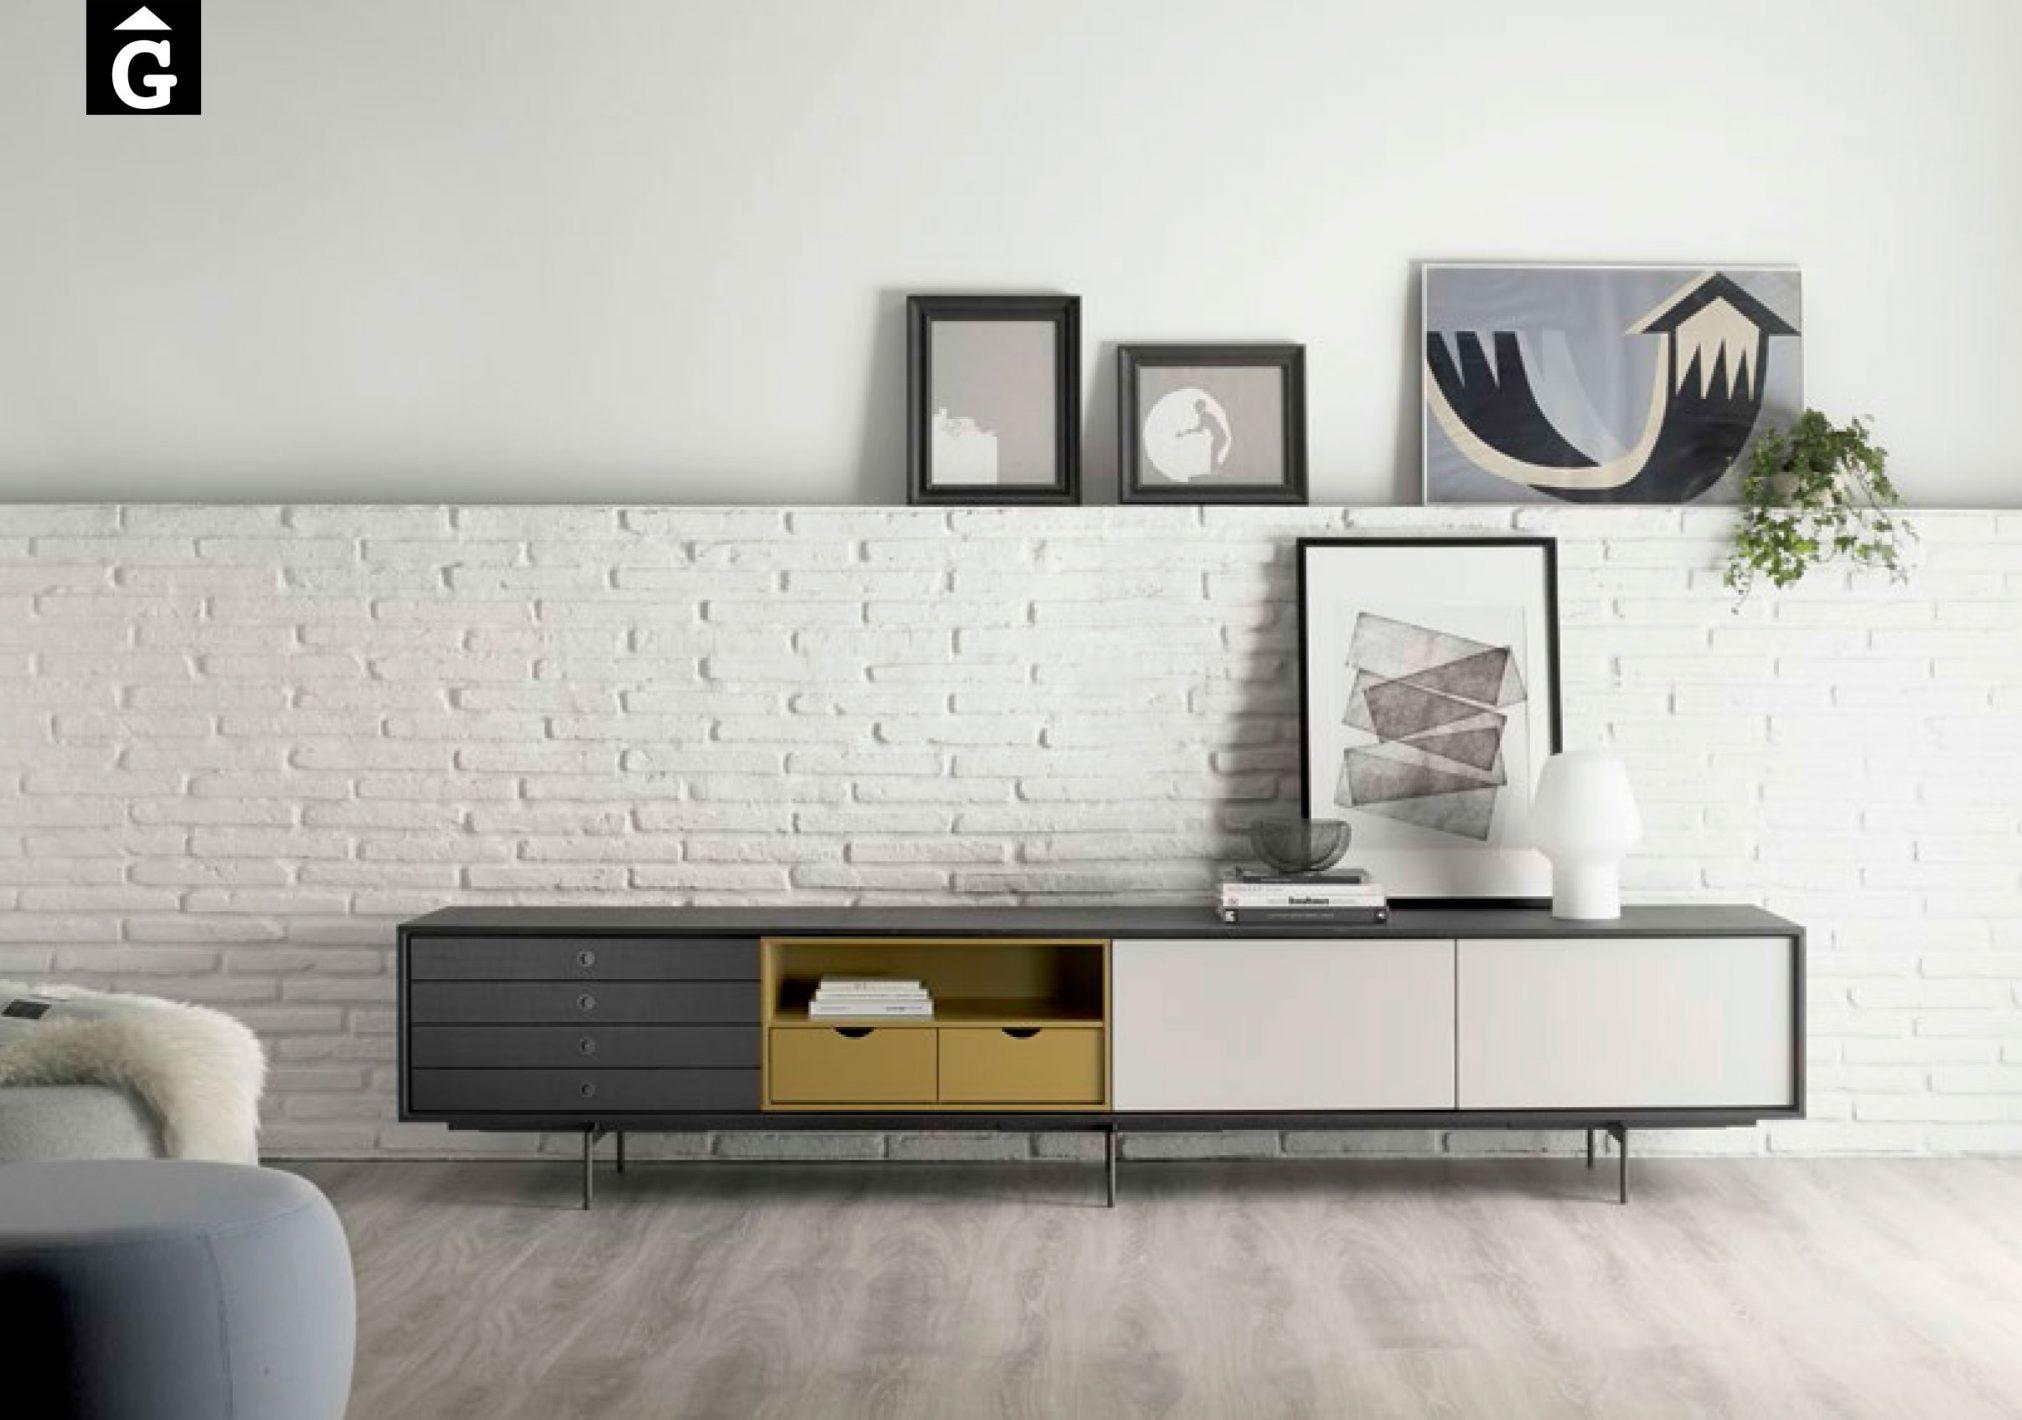 Treku-&-mobles-Gifreu-qualitat-vanguarda-valor-segur-1